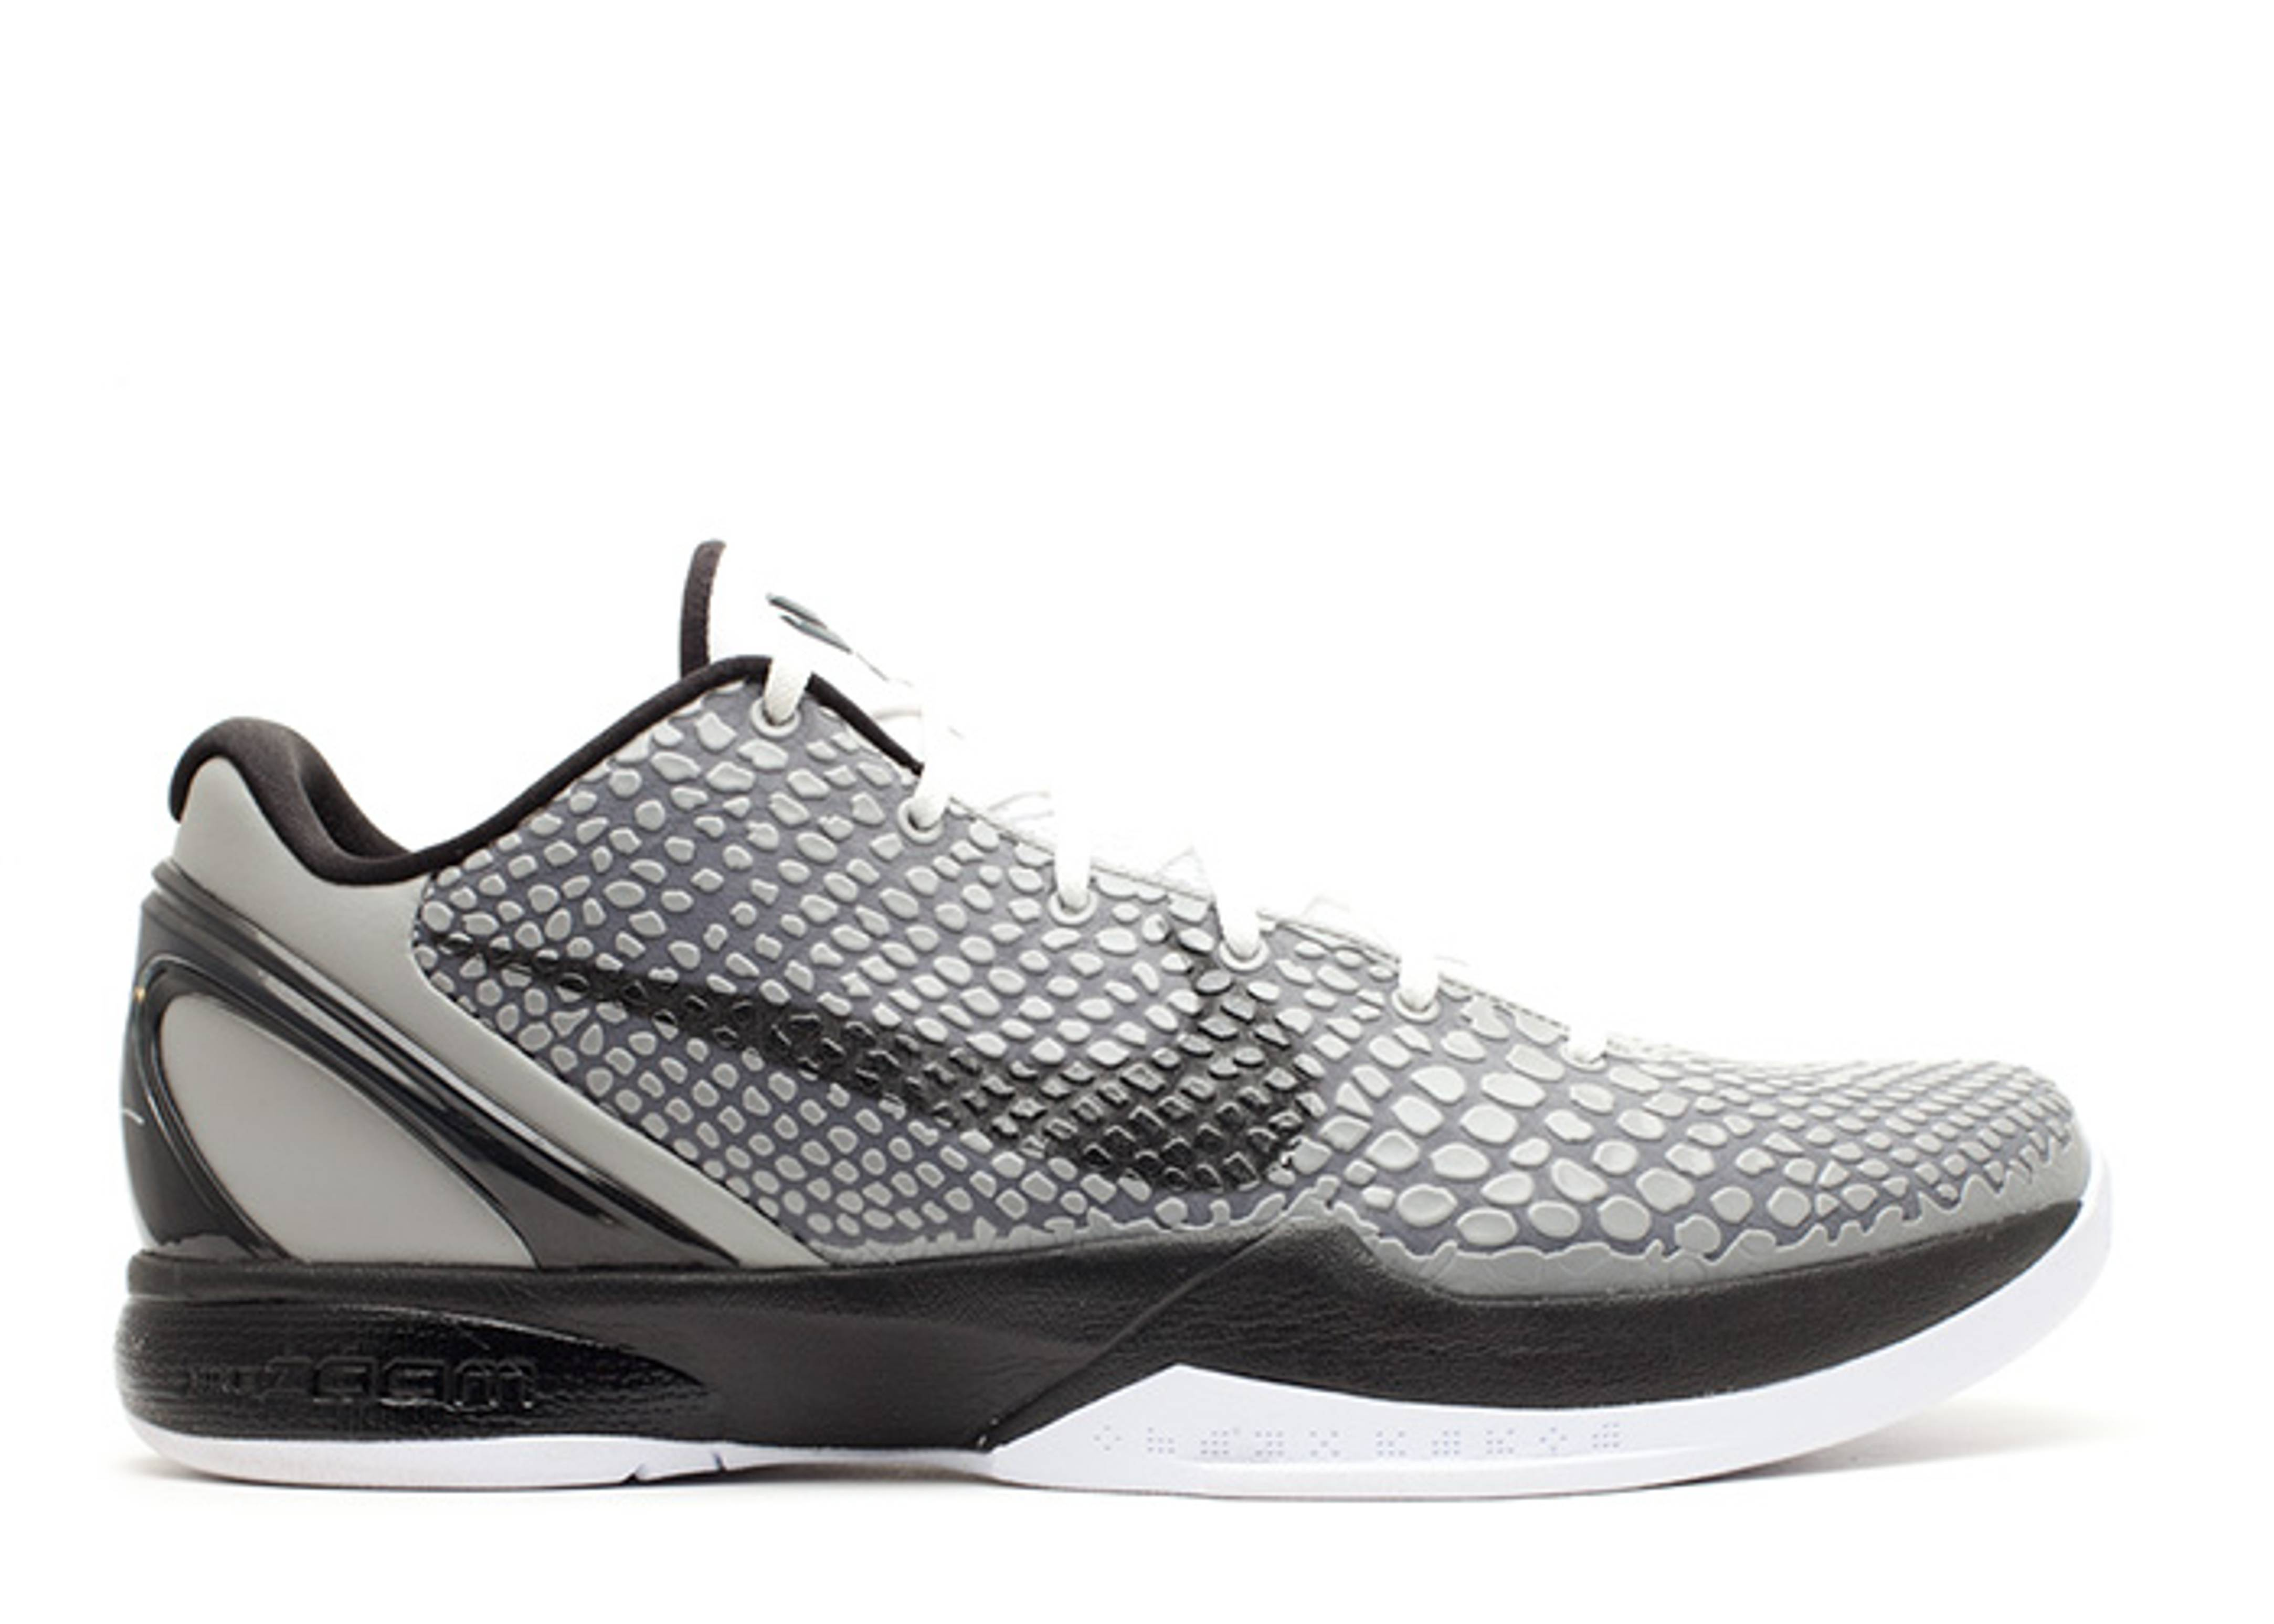 7646551e79fb Zoom Kobe 6 - Nike - 429659 007 - medium grey black-white